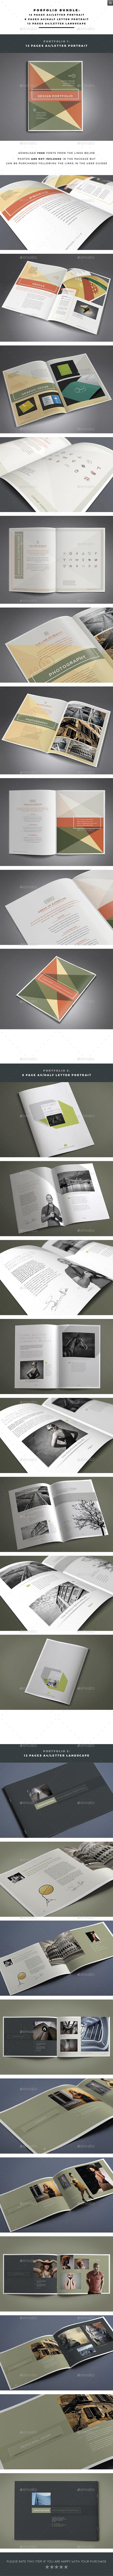 Portfolios Bundle - Portfolio Brochures